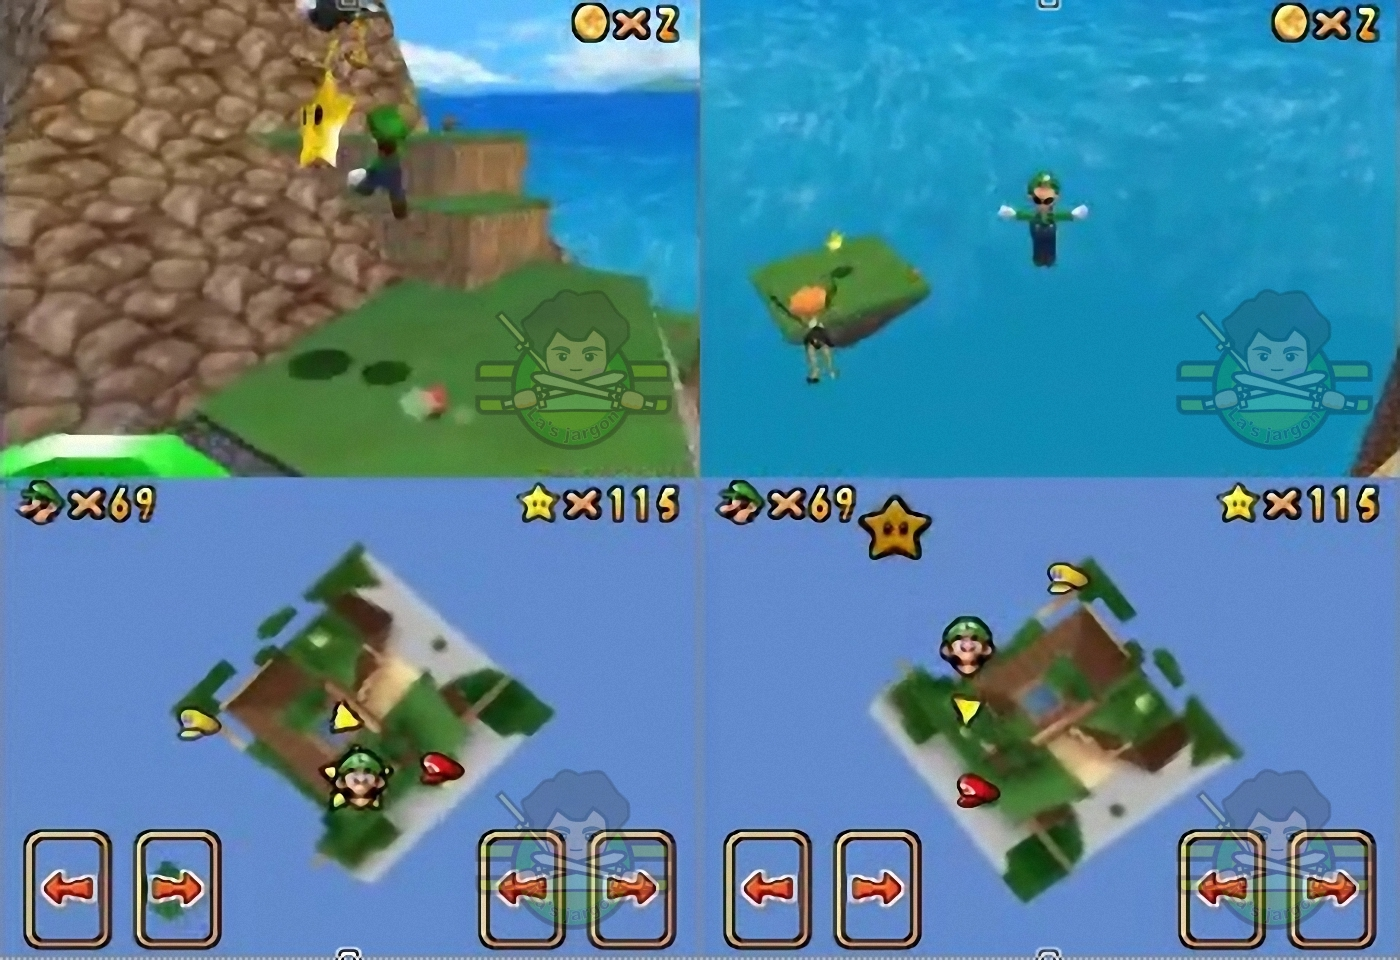 La's jargon: 【NDS|圖文|流程攻略】超級瑪利歐 64 DS(超級馬力歐 / 超級馬里奧 / スーパーマリオ 64 / Super Mario ...